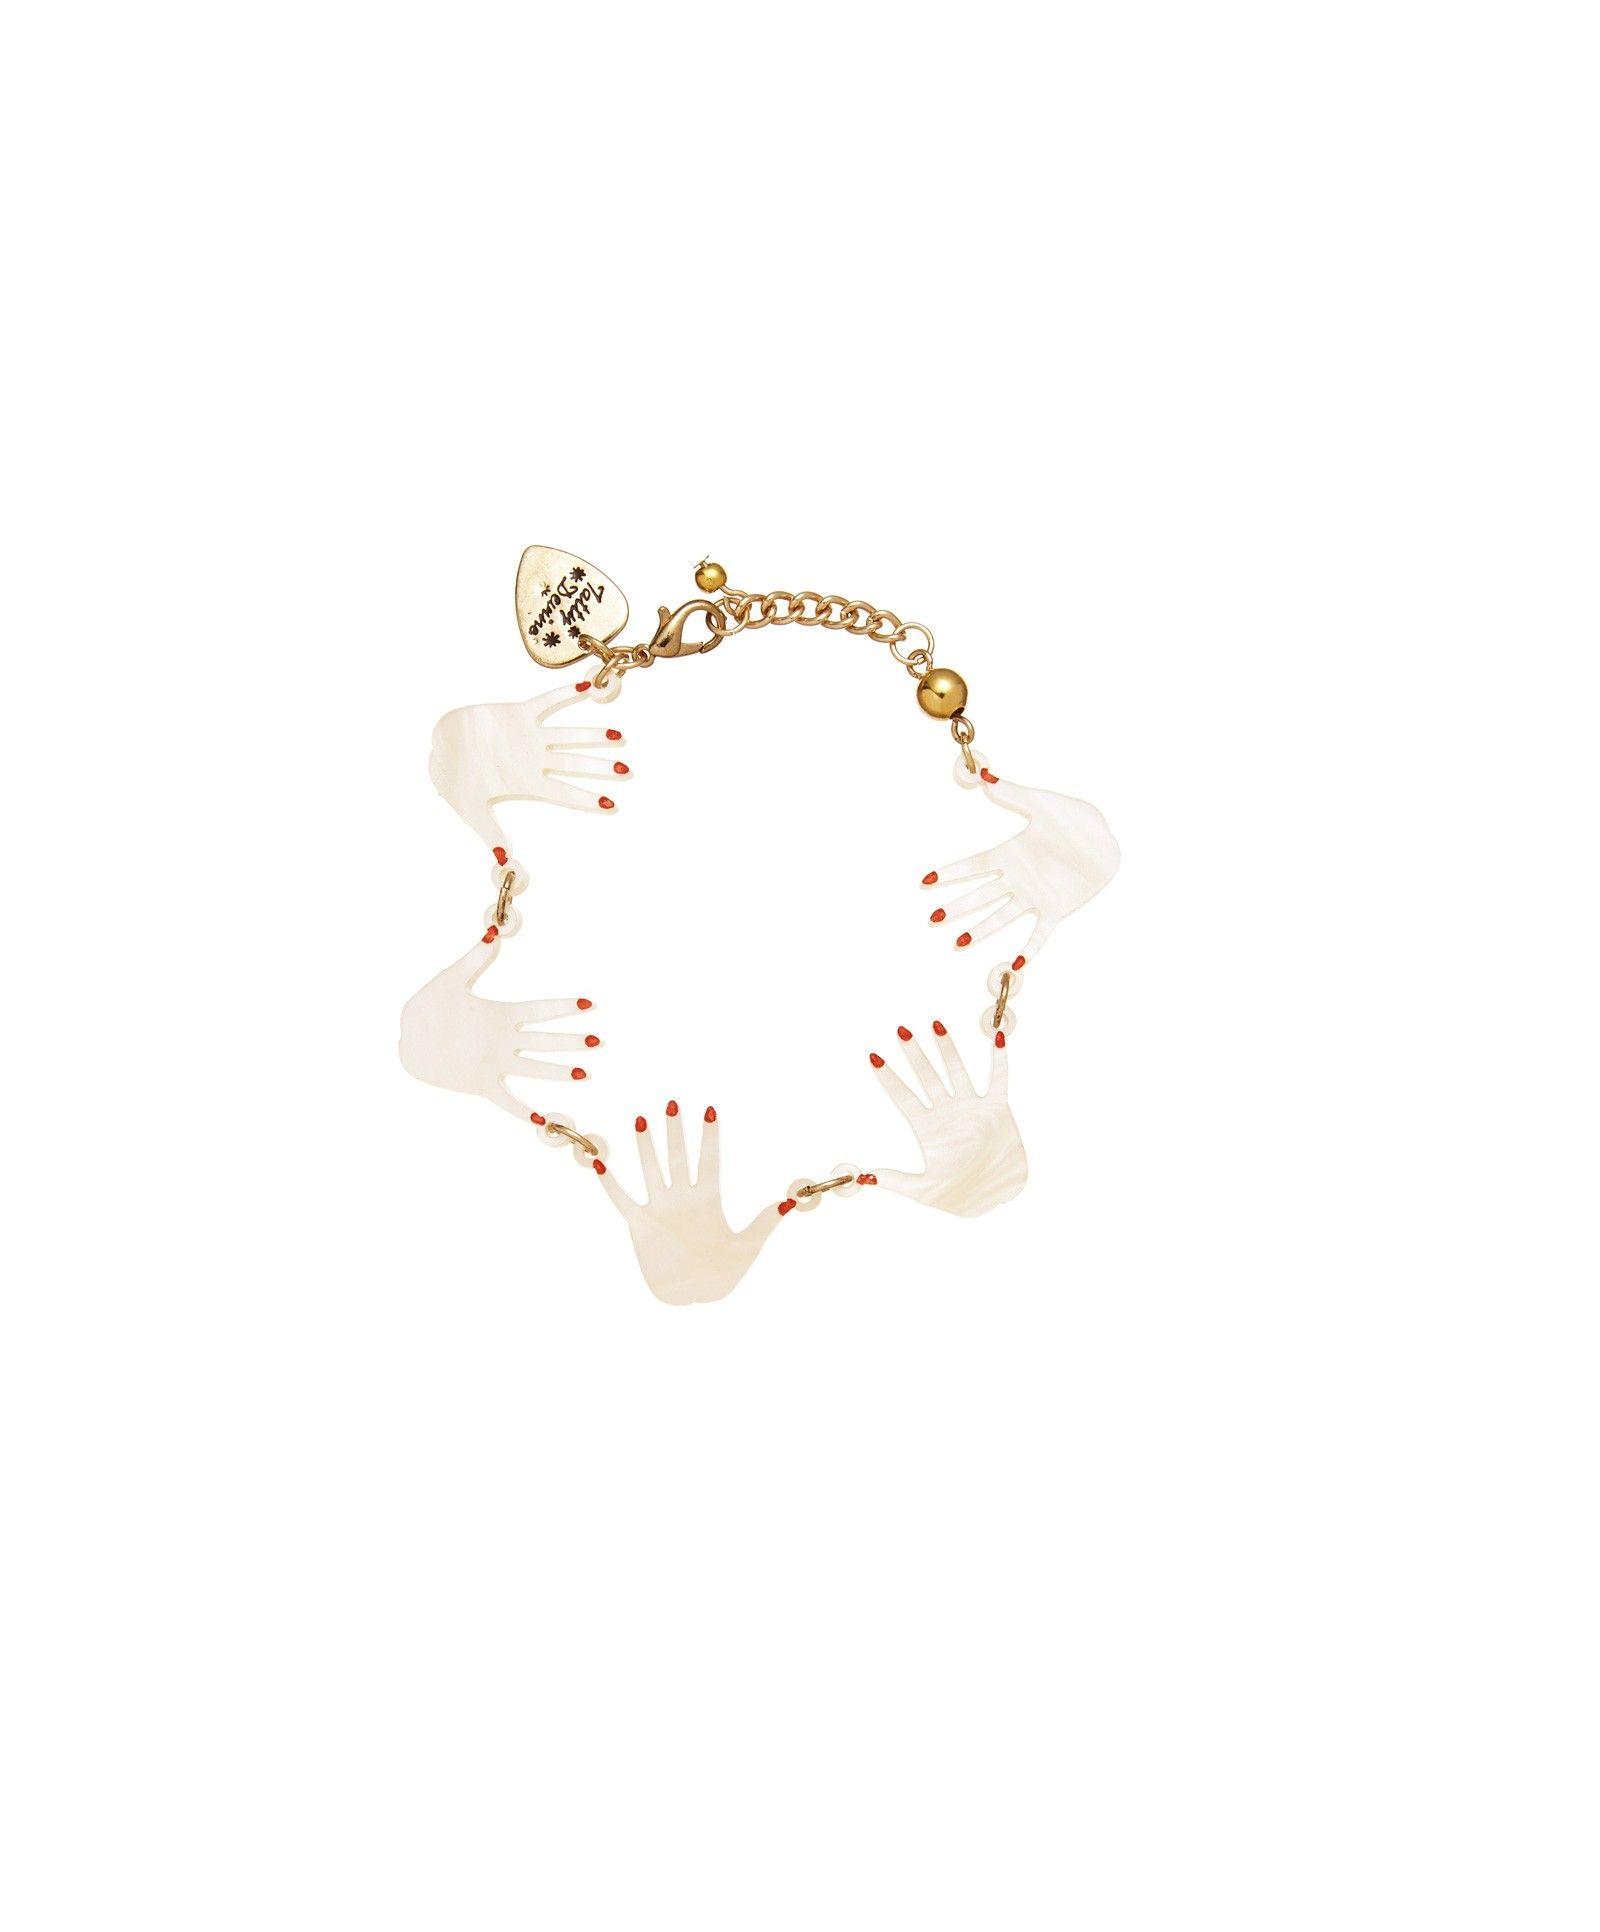 Seance hands bracelet jewelry pinterest hand bracelet